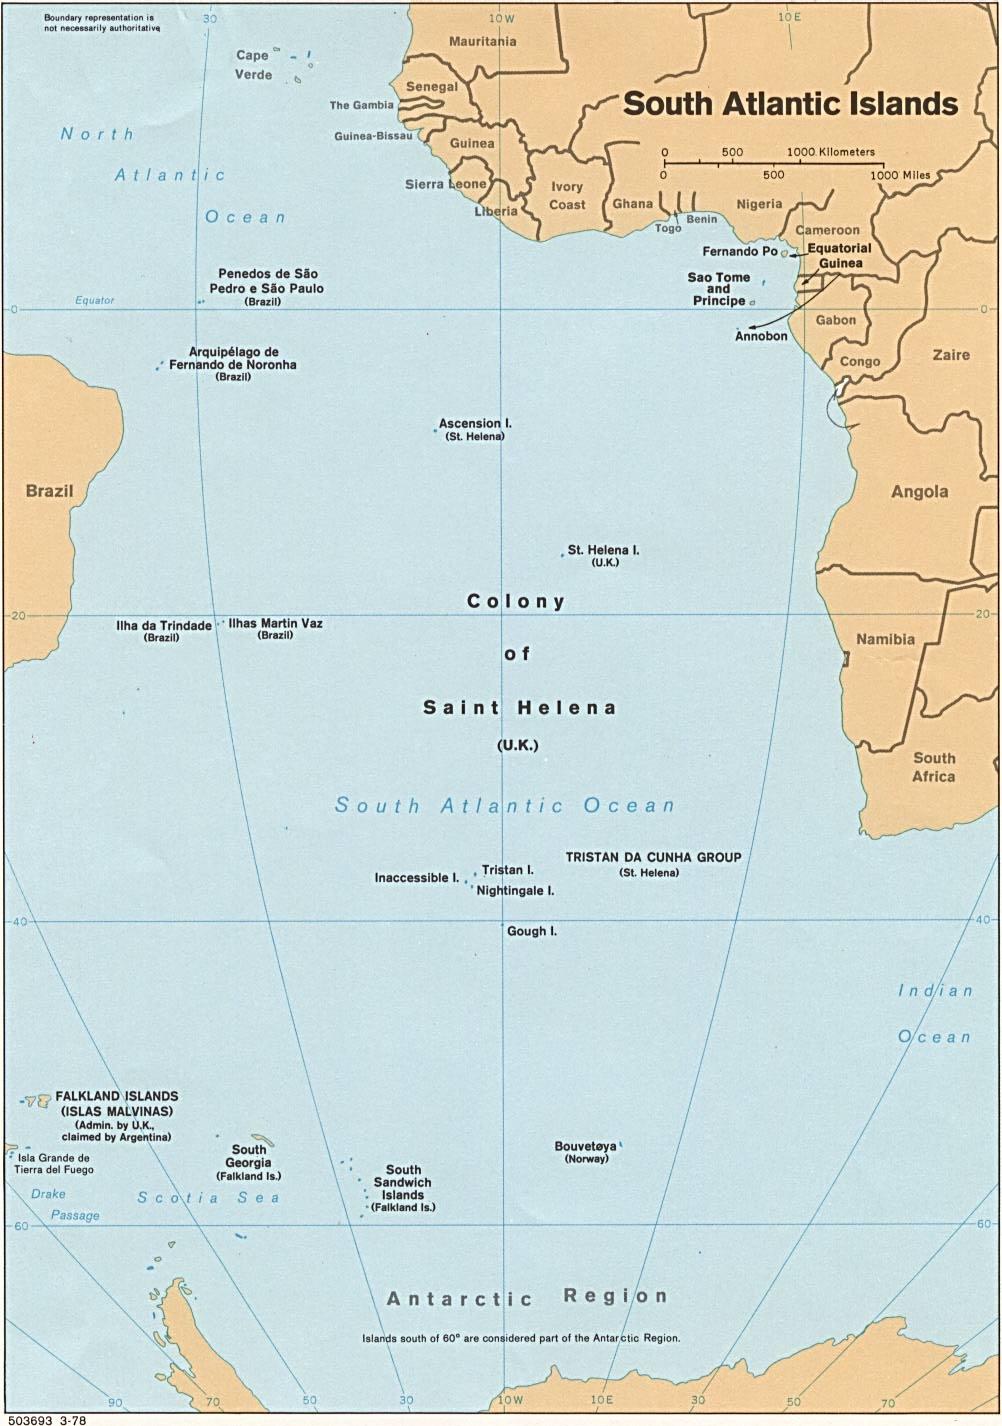 South Atlantic Islands - Full size